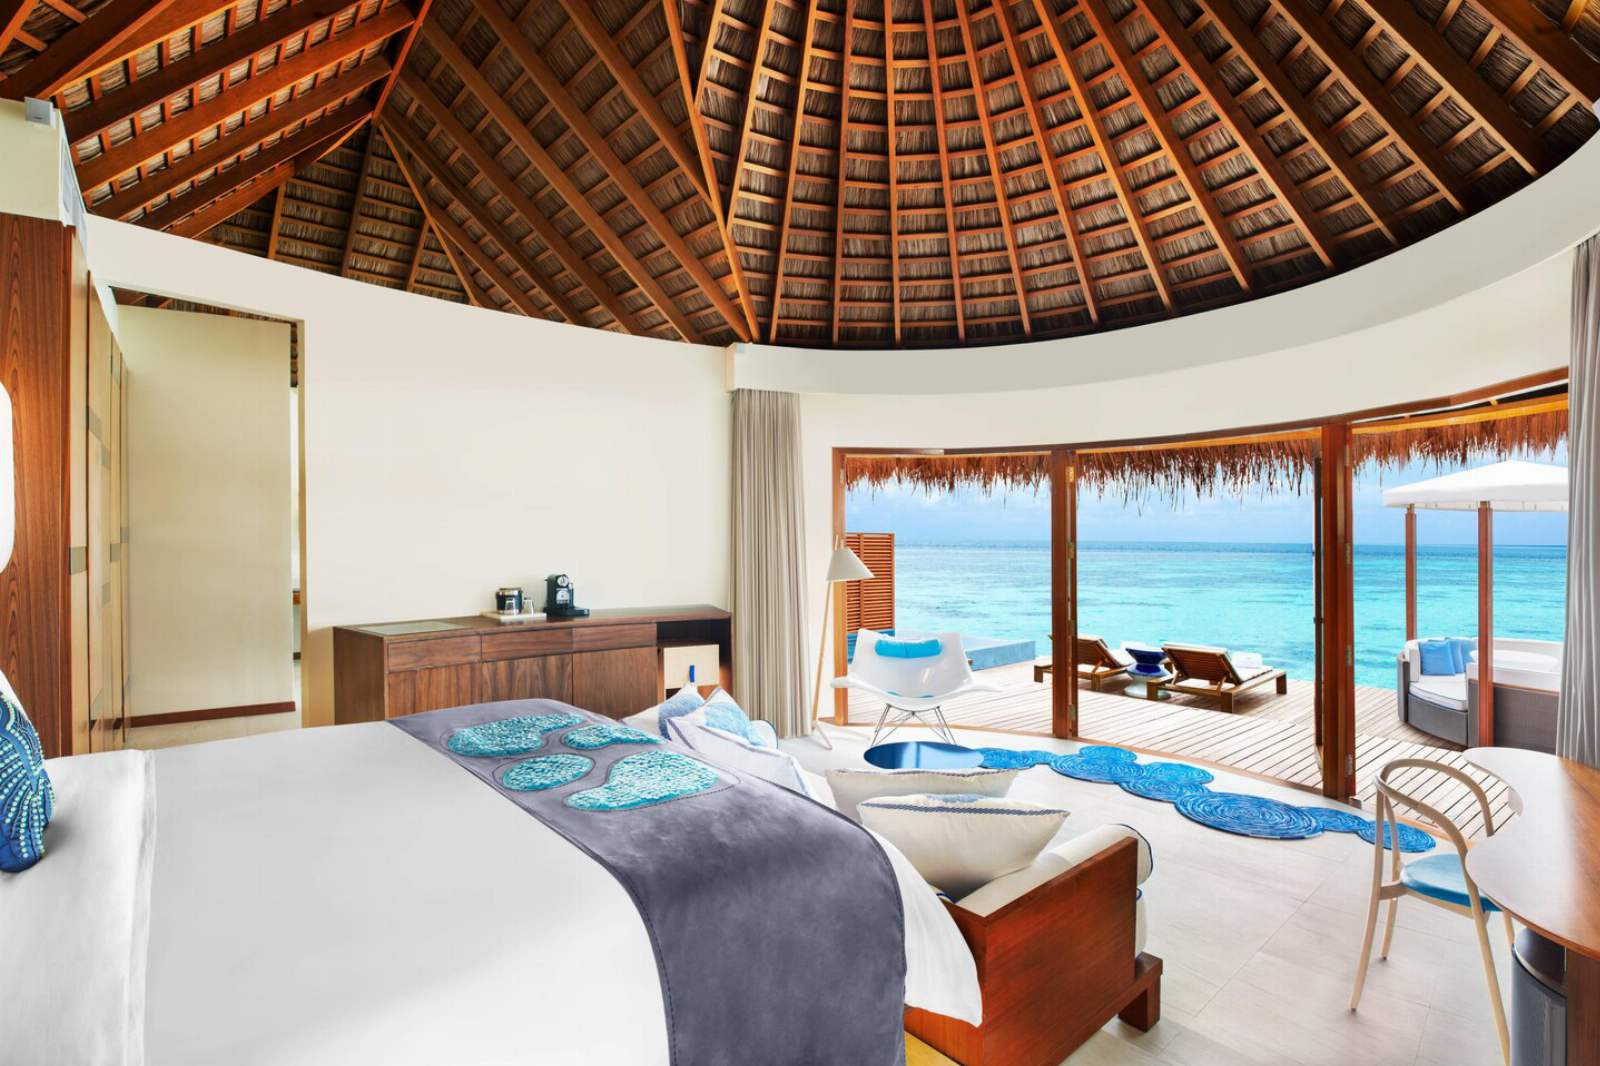 W Maldives - Fabulous Overwater Oasis